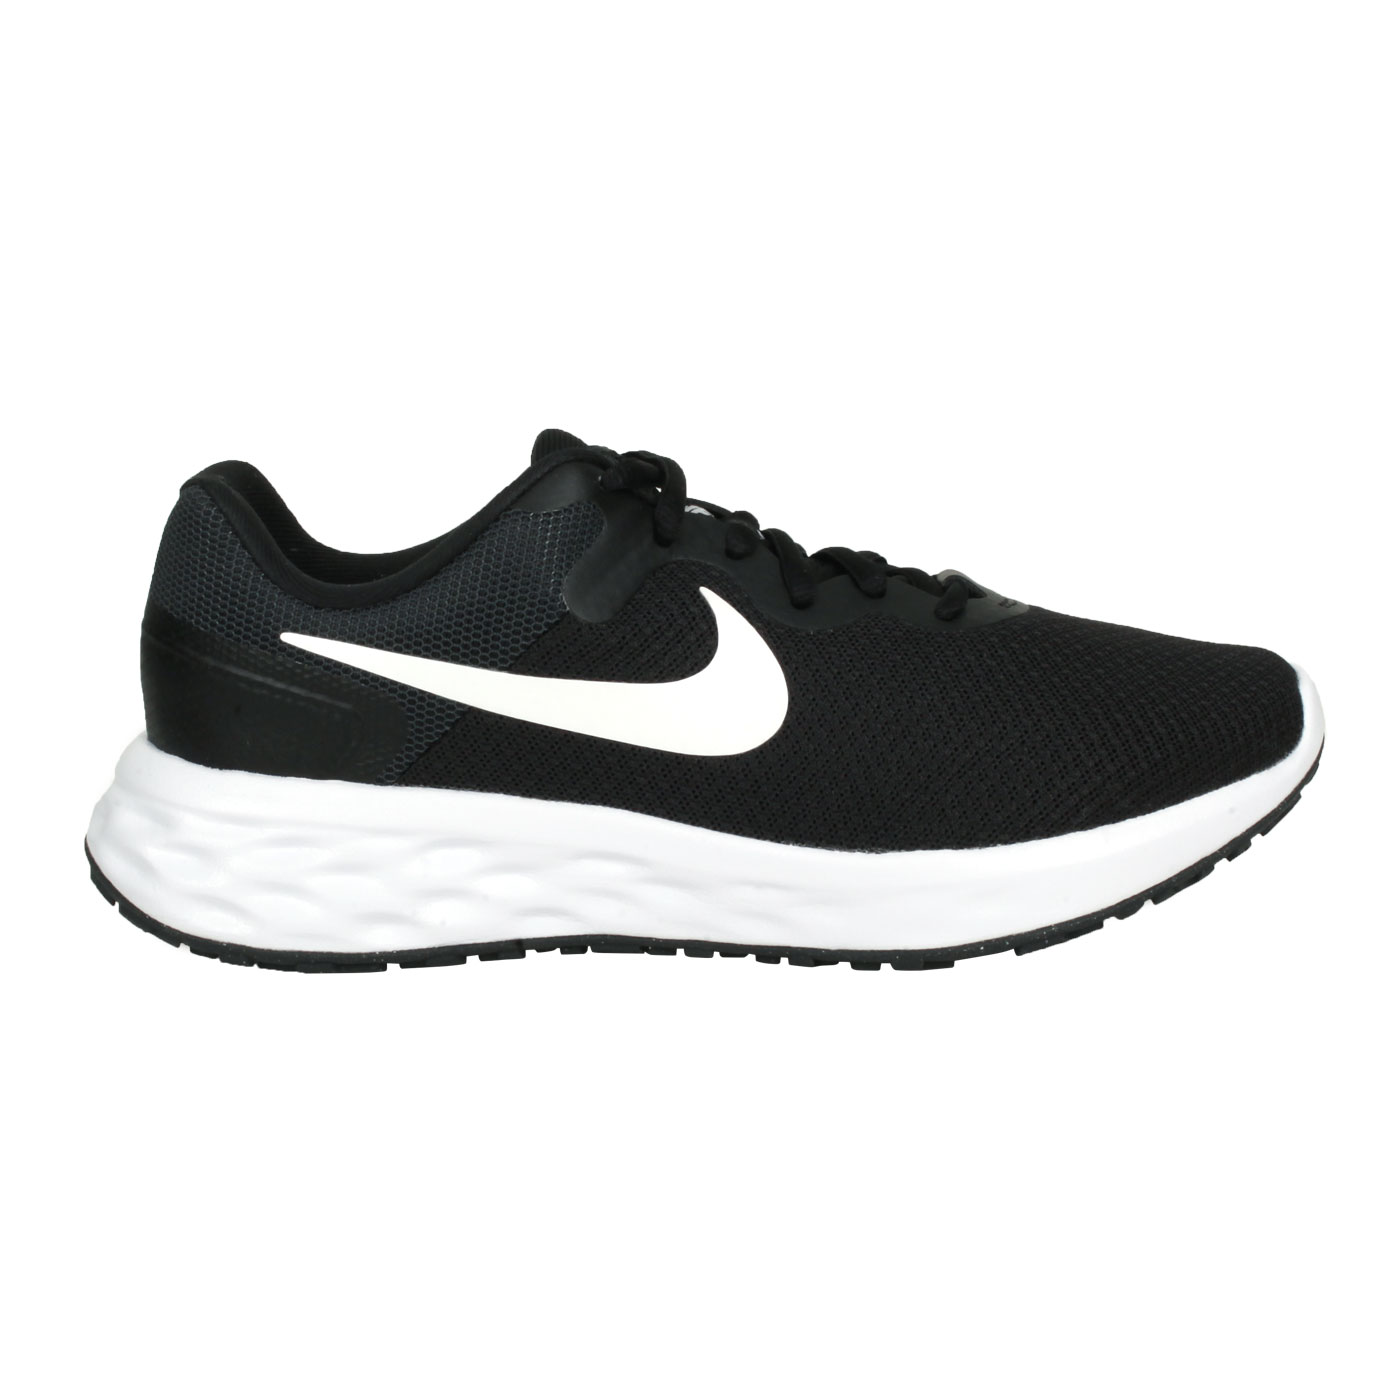 NIKE 女款運動鞋  @W REVOLUTION 6 NN@DC3729-003 - 黑白綠